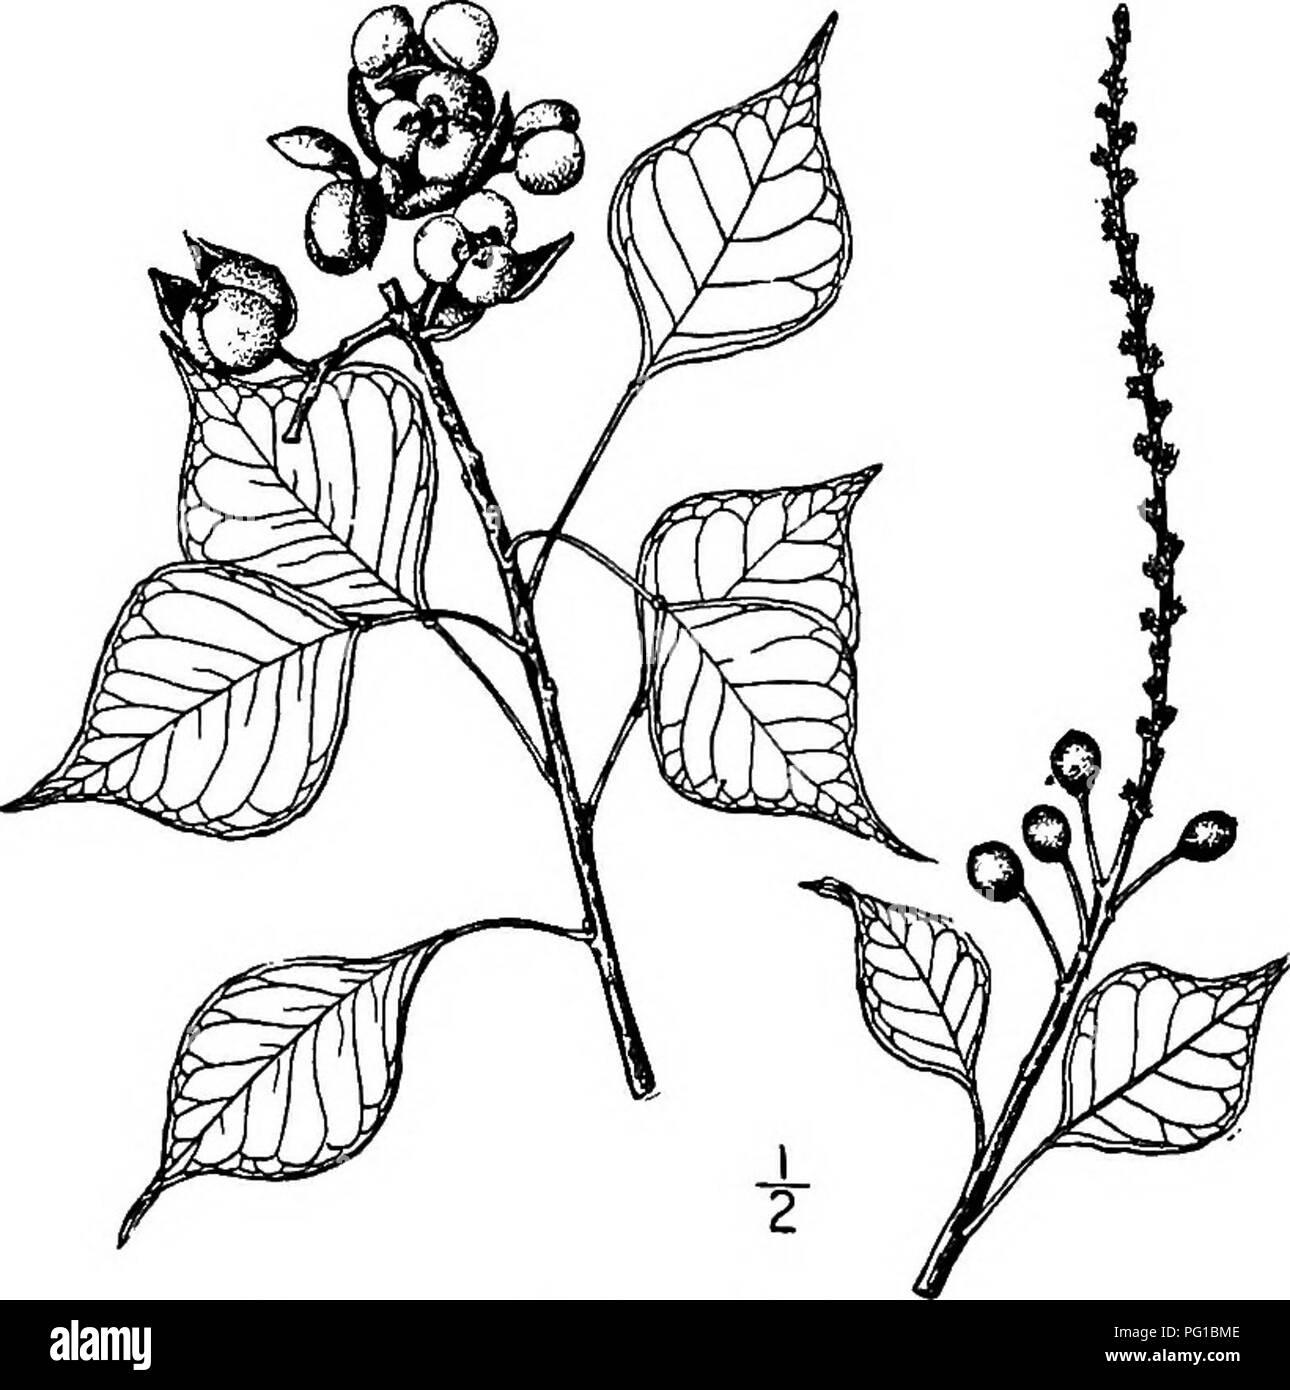 Milk tree: photo, description, where it grows 52